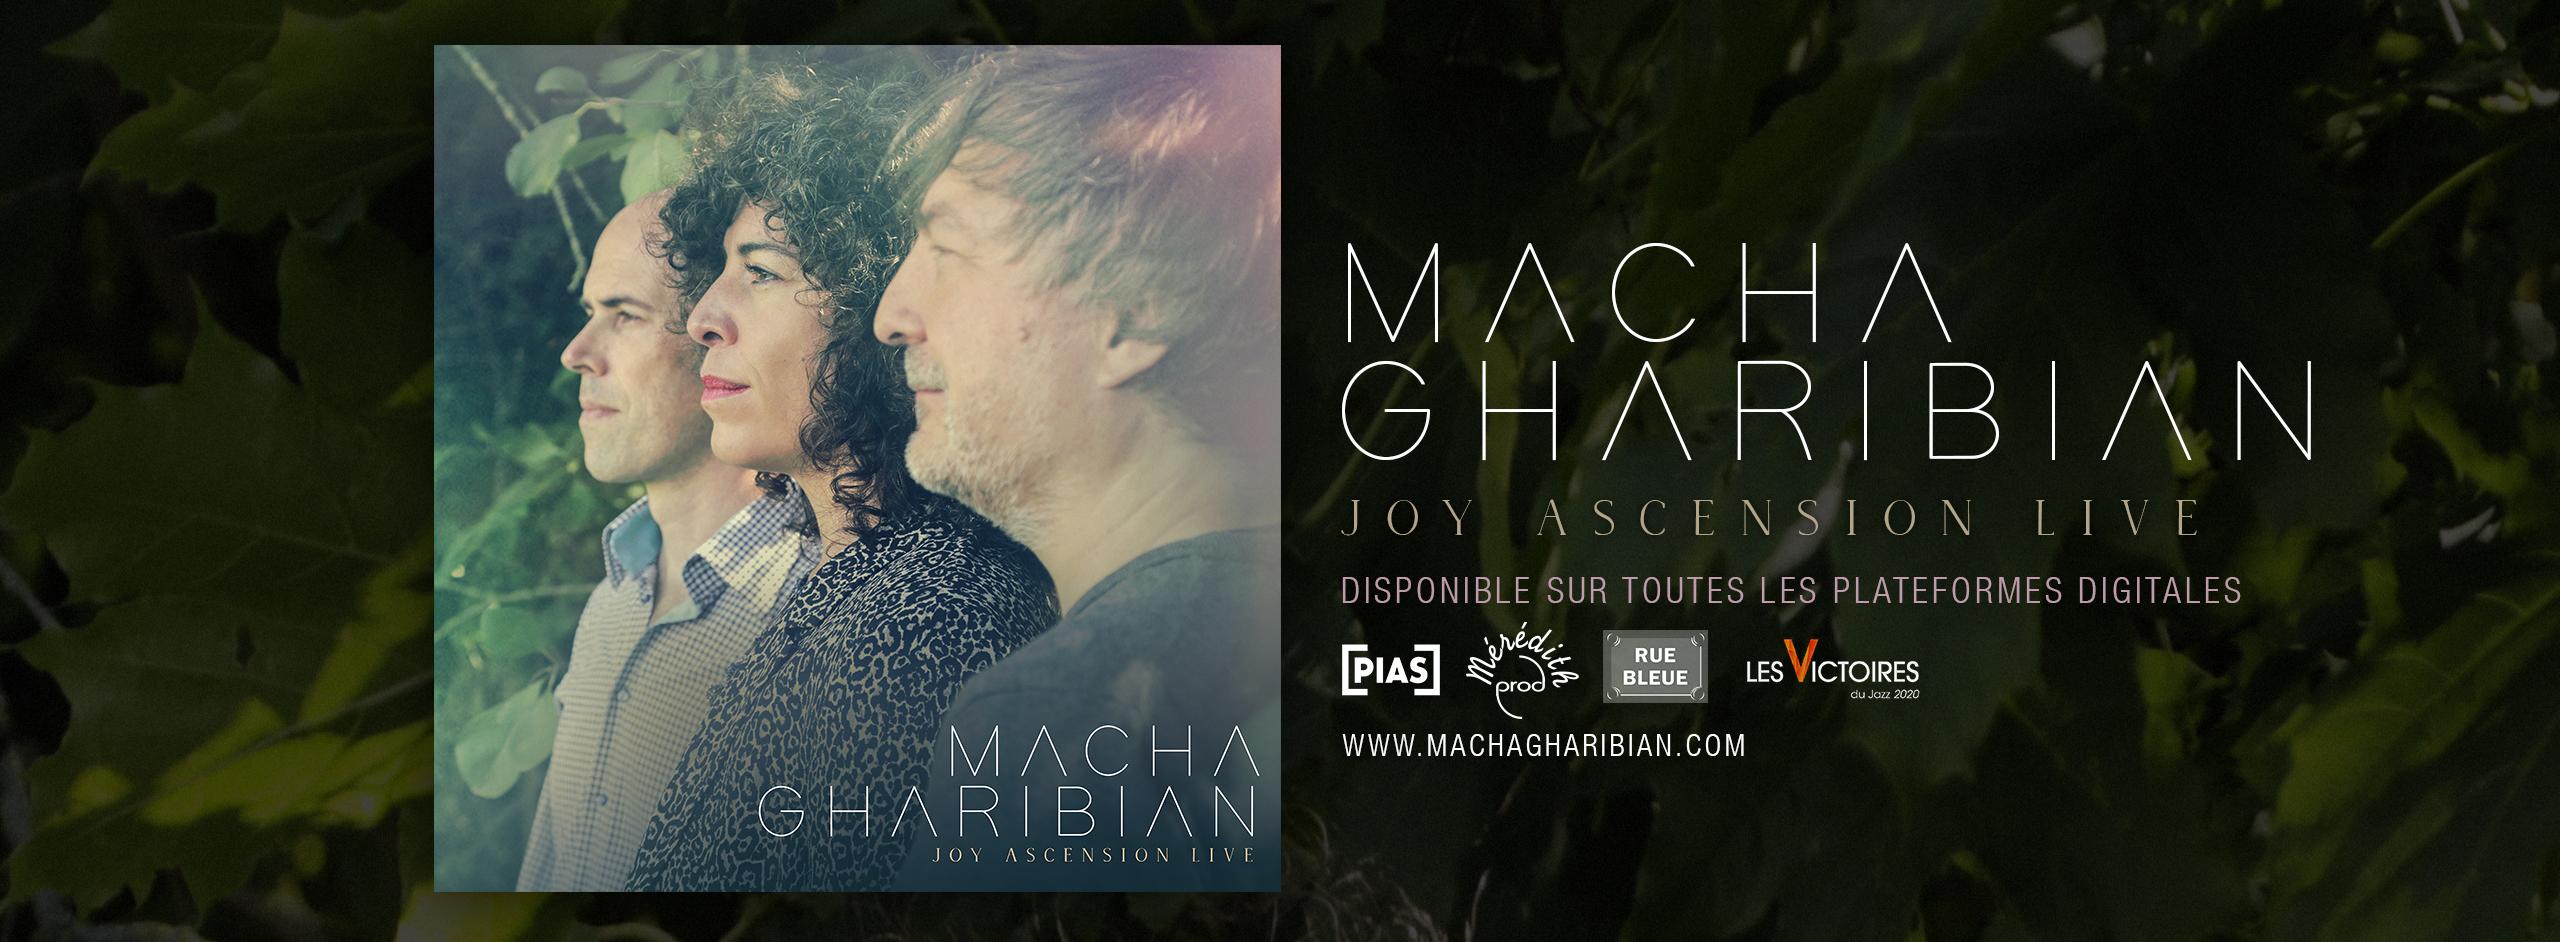 macha gharibian - Joy ascencion livze - bandeau site